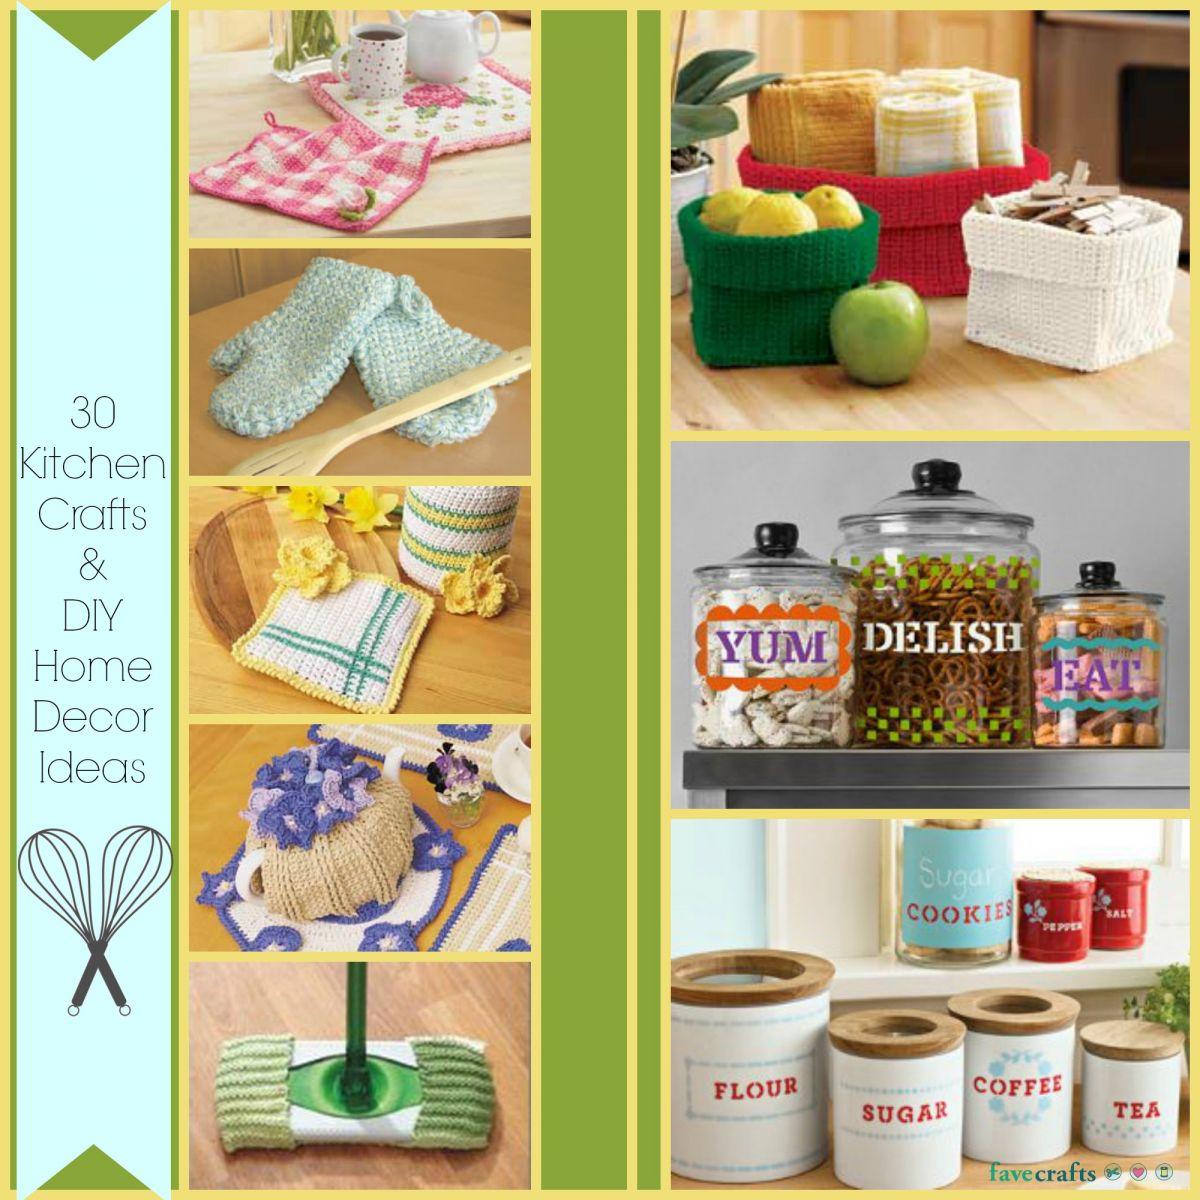 26 Kitchen Crafts and DIY Home Decor Ideas diy kitchen ideas 30 Kitchen Crafts and DIY Home Decor Ideas